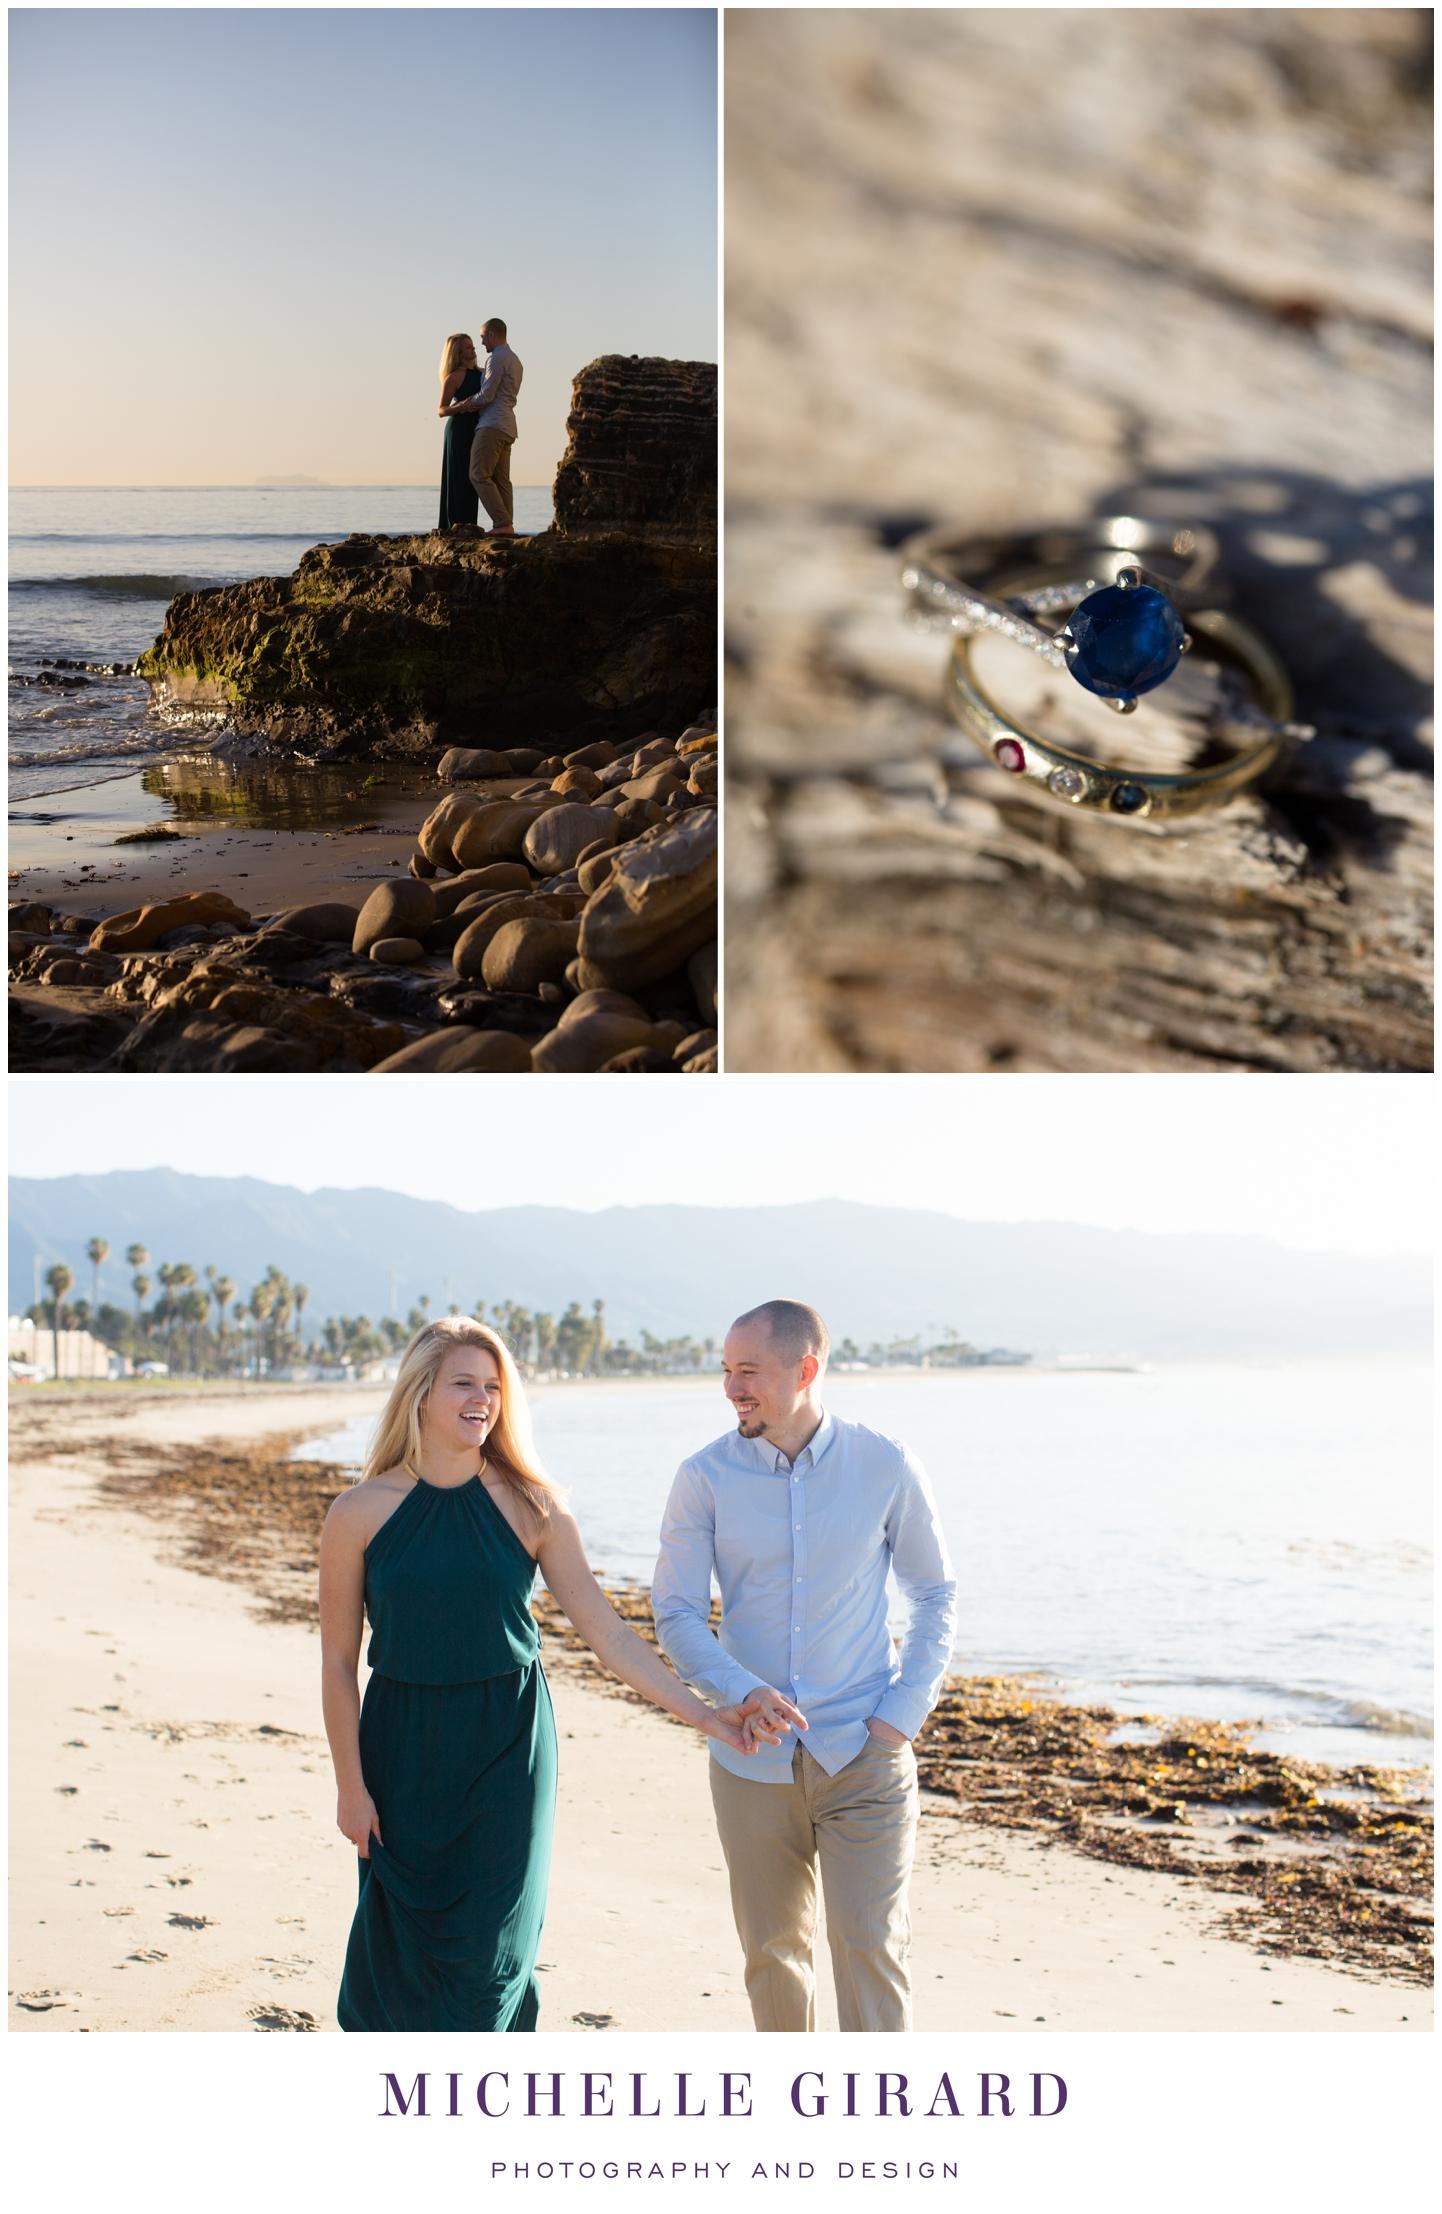 santa-barbara-california-engagement-photography-sunrise-theater-beach-michelle-girard09.jpg